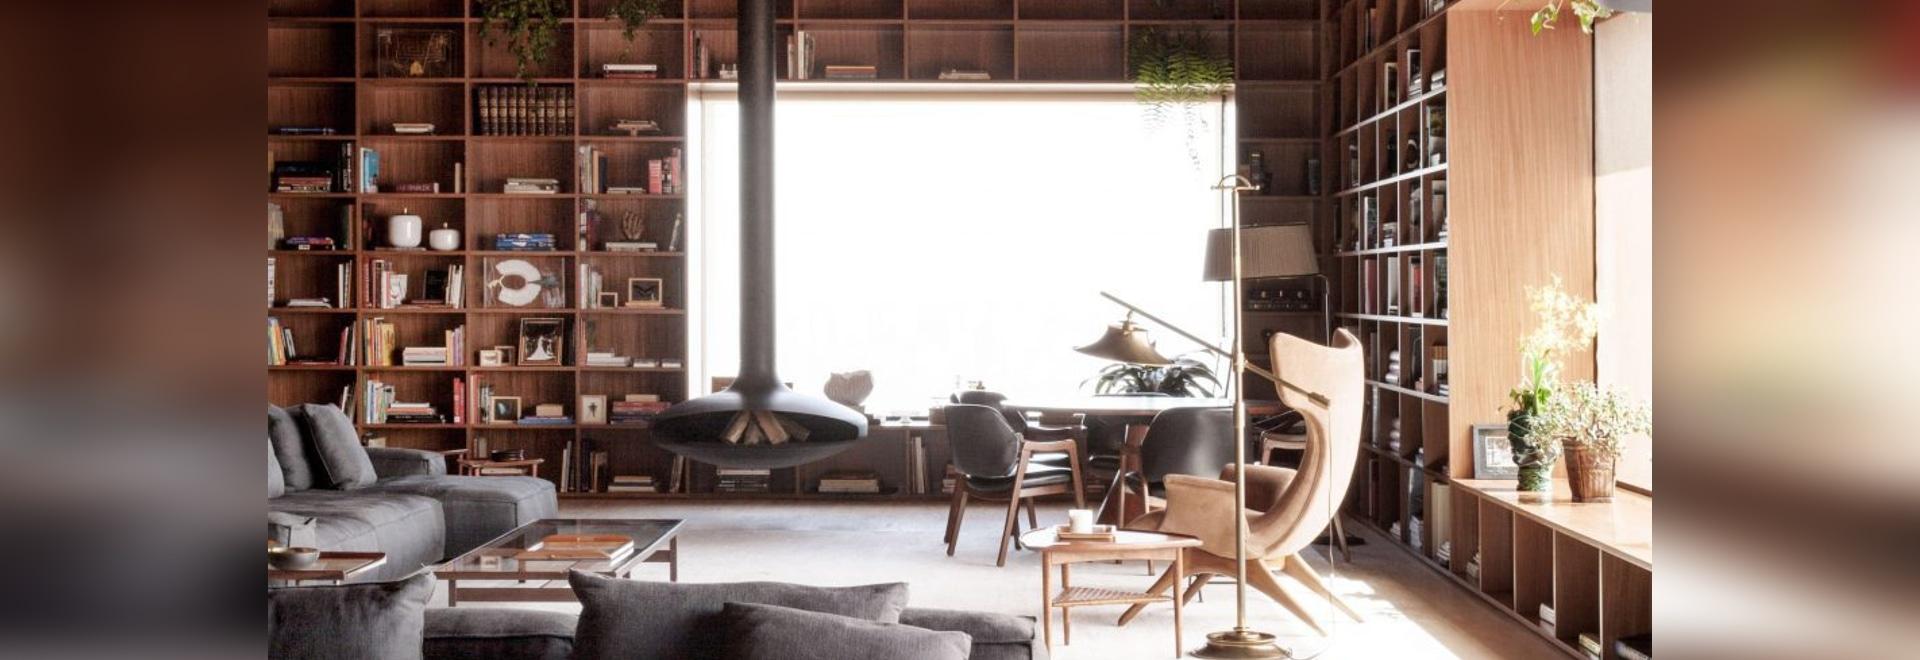 Studio MK27 creates giant shelving units in São Paulo penthouse